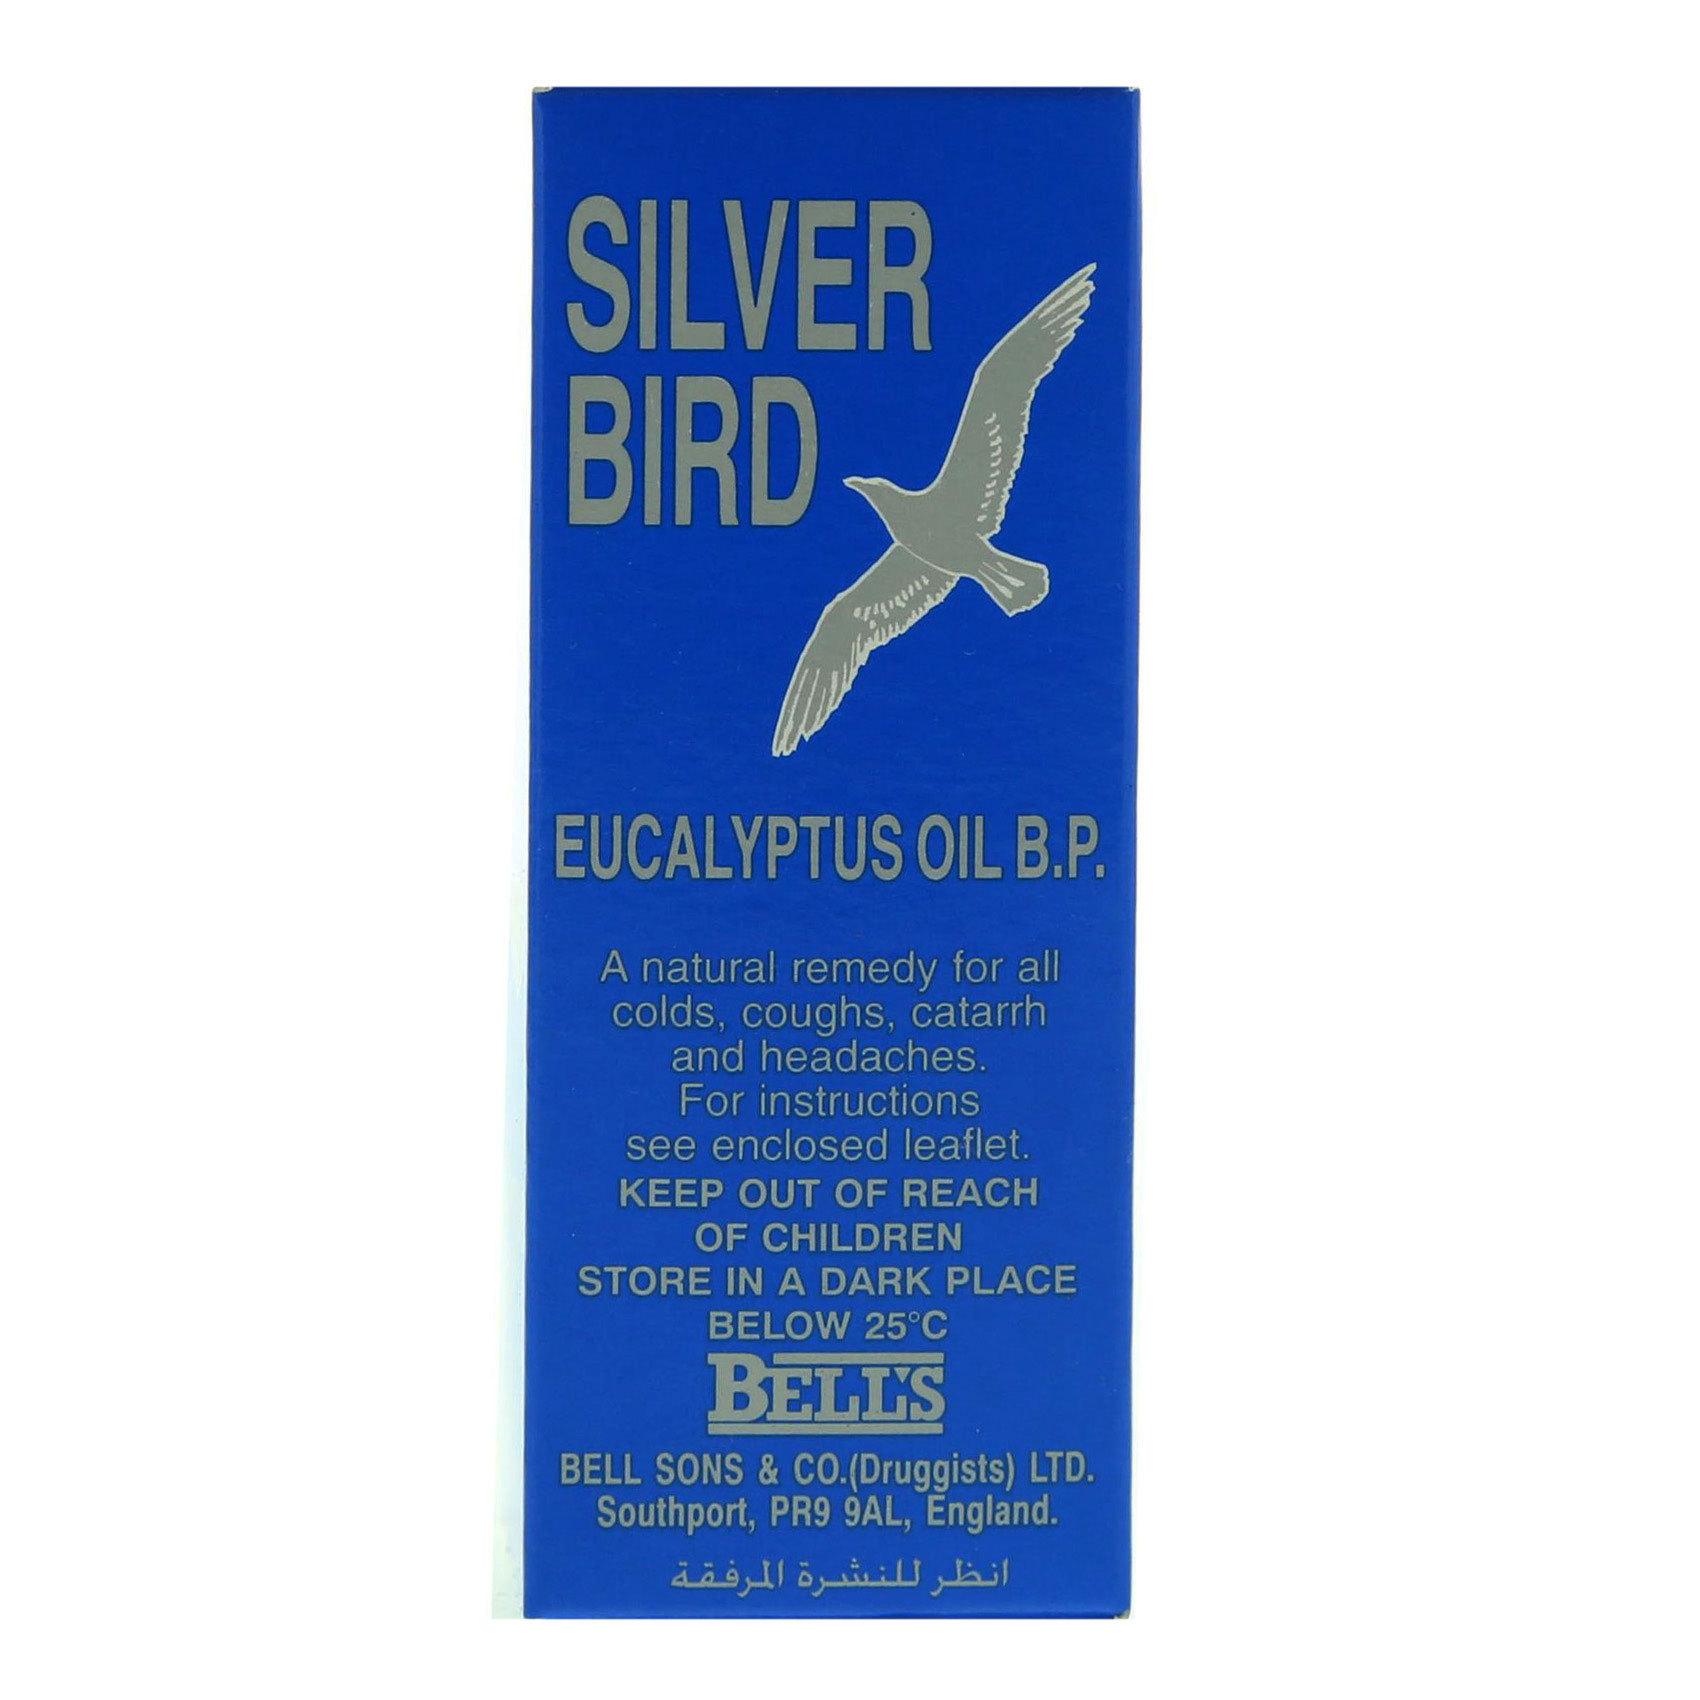 SILVERBIRD EUCALYPTUS OIL B.P. 28ML